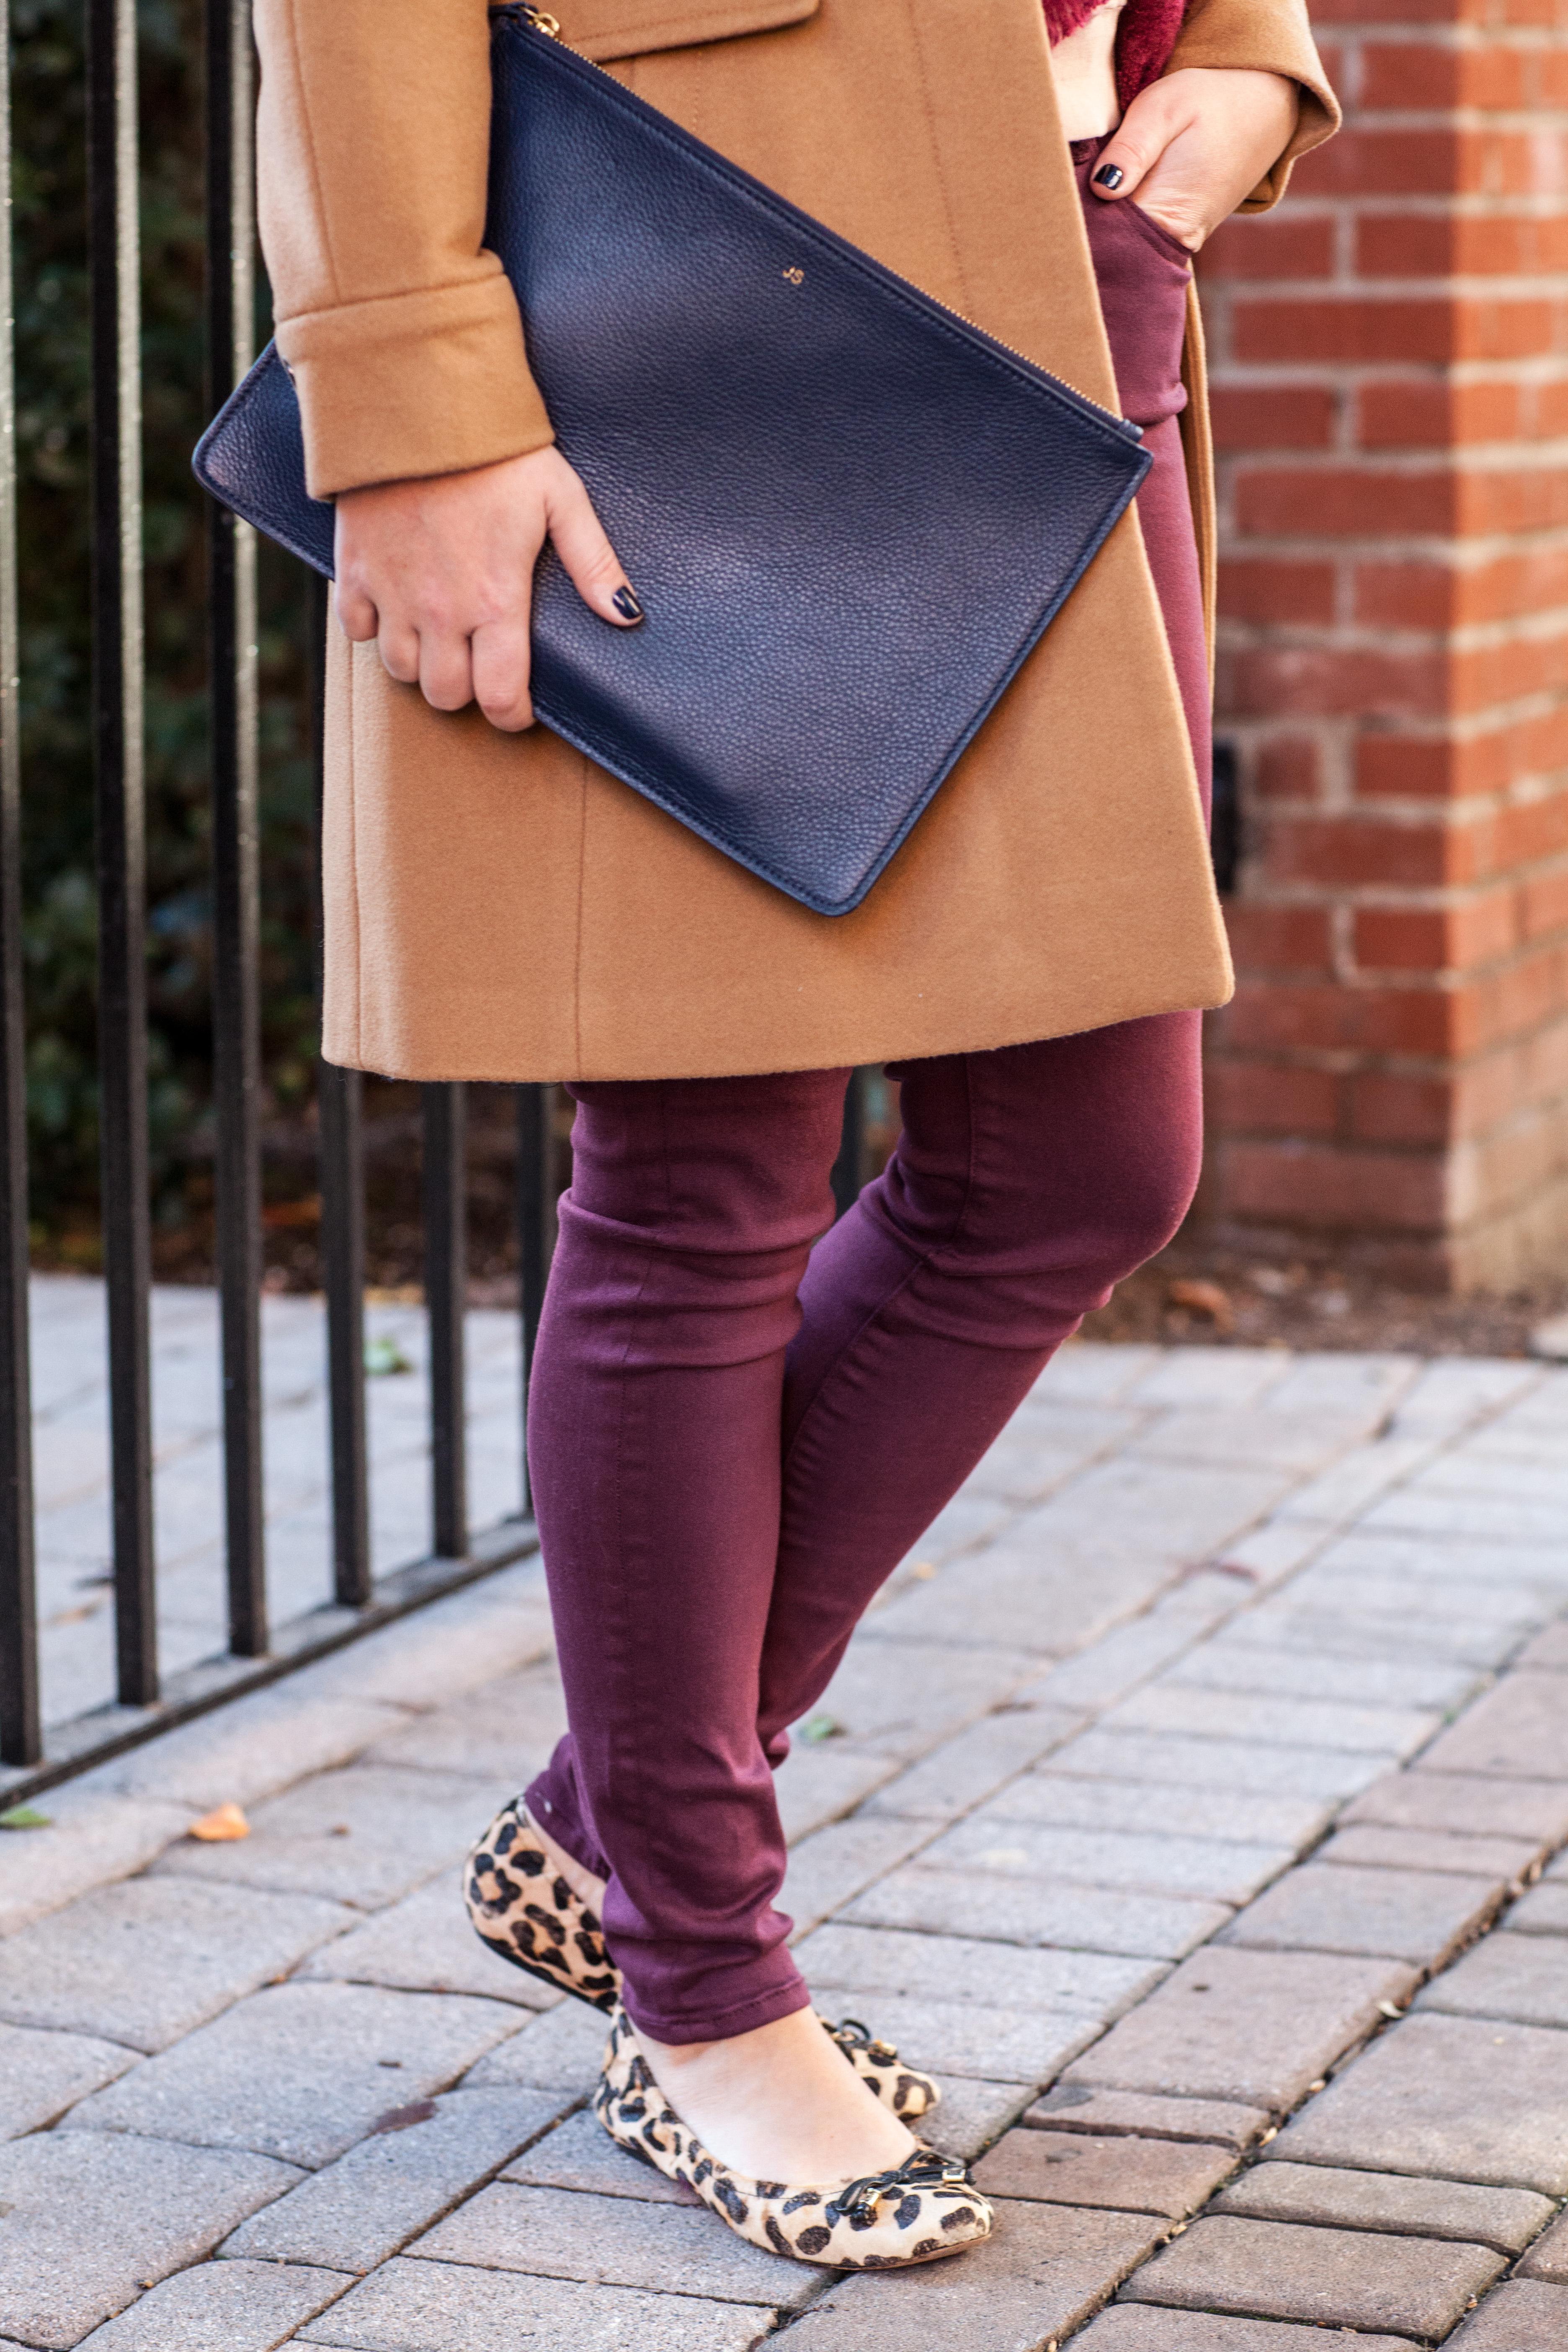 Camel Colored Coat Bows Amp Sequins